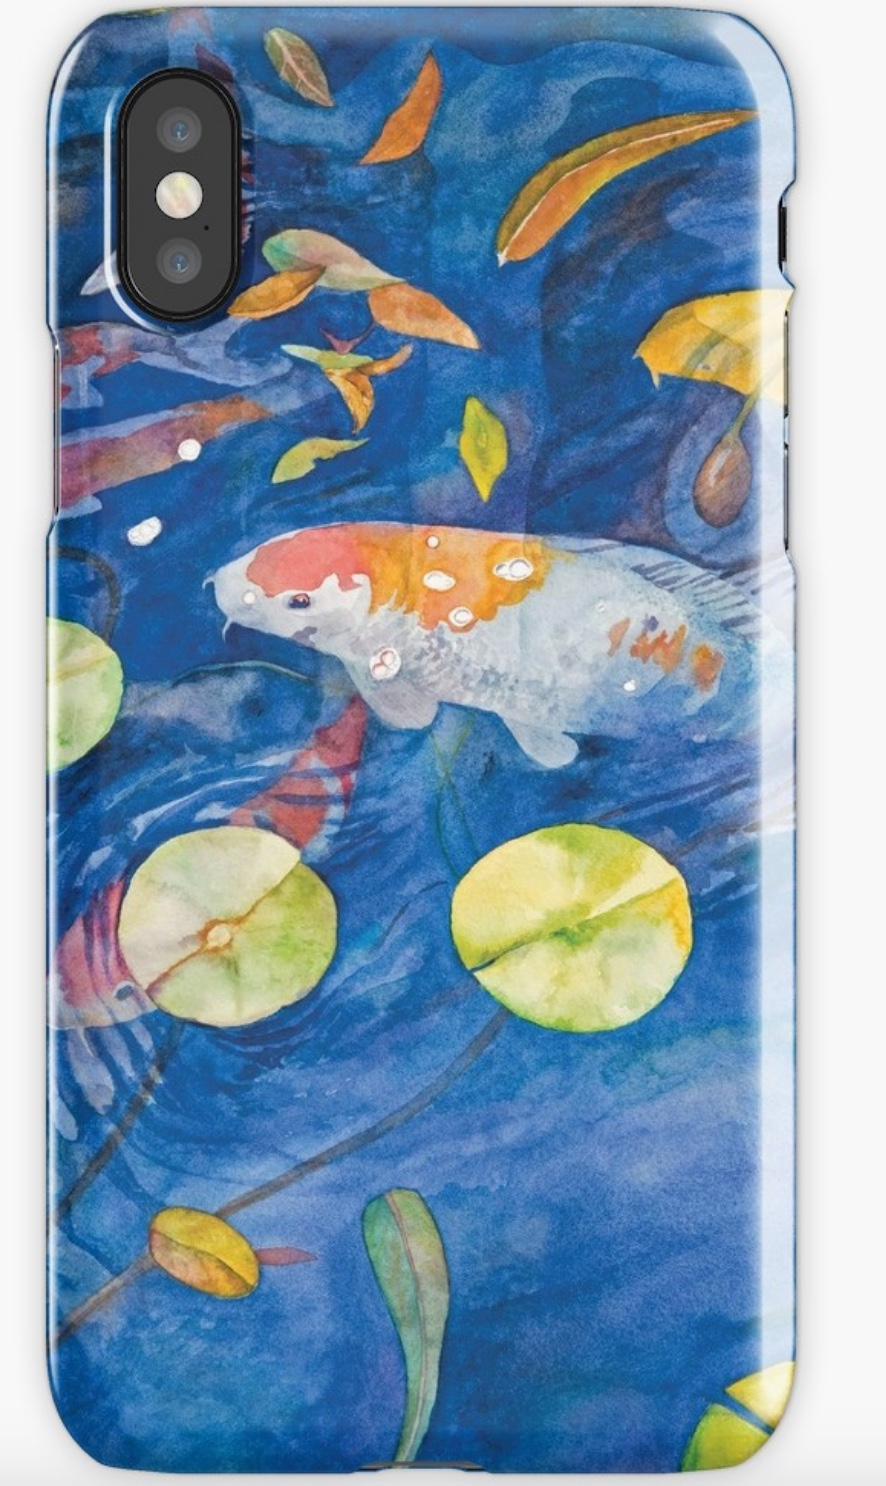 Kodama-Koi-Pond-iPhone-Case.jpeg